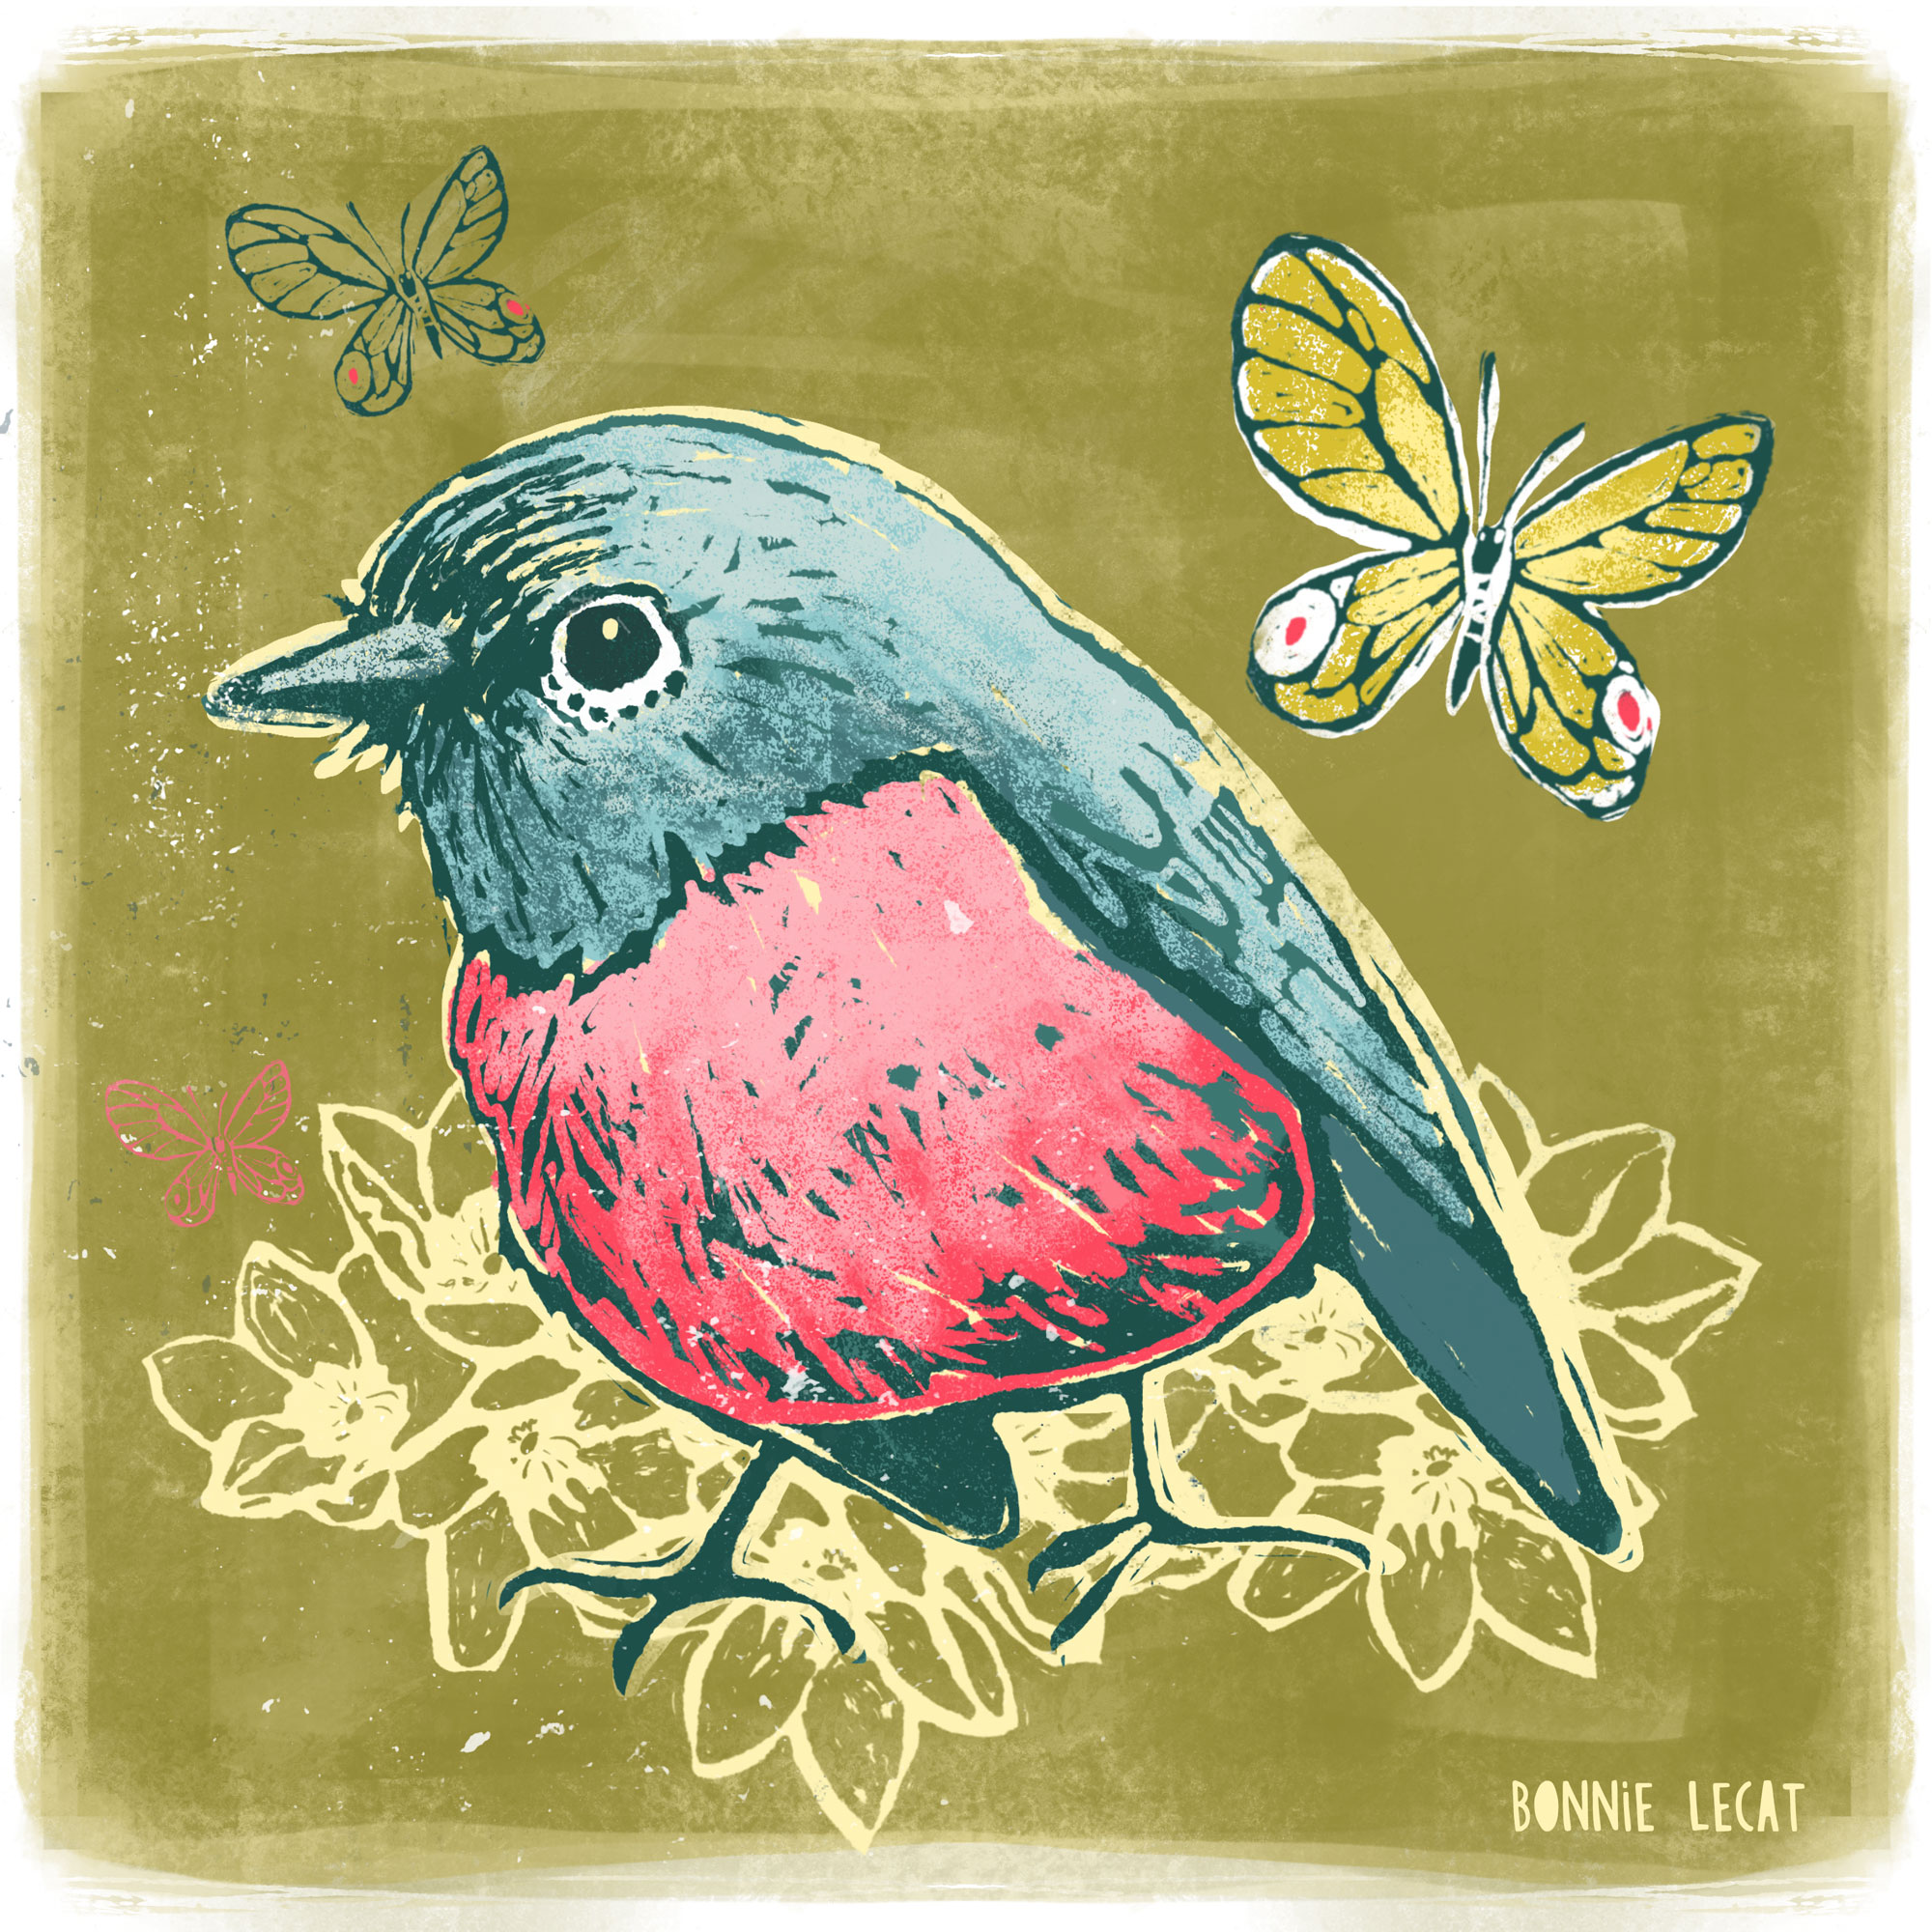 Birds and butterflies digital illustration by Bonnie Lecat.